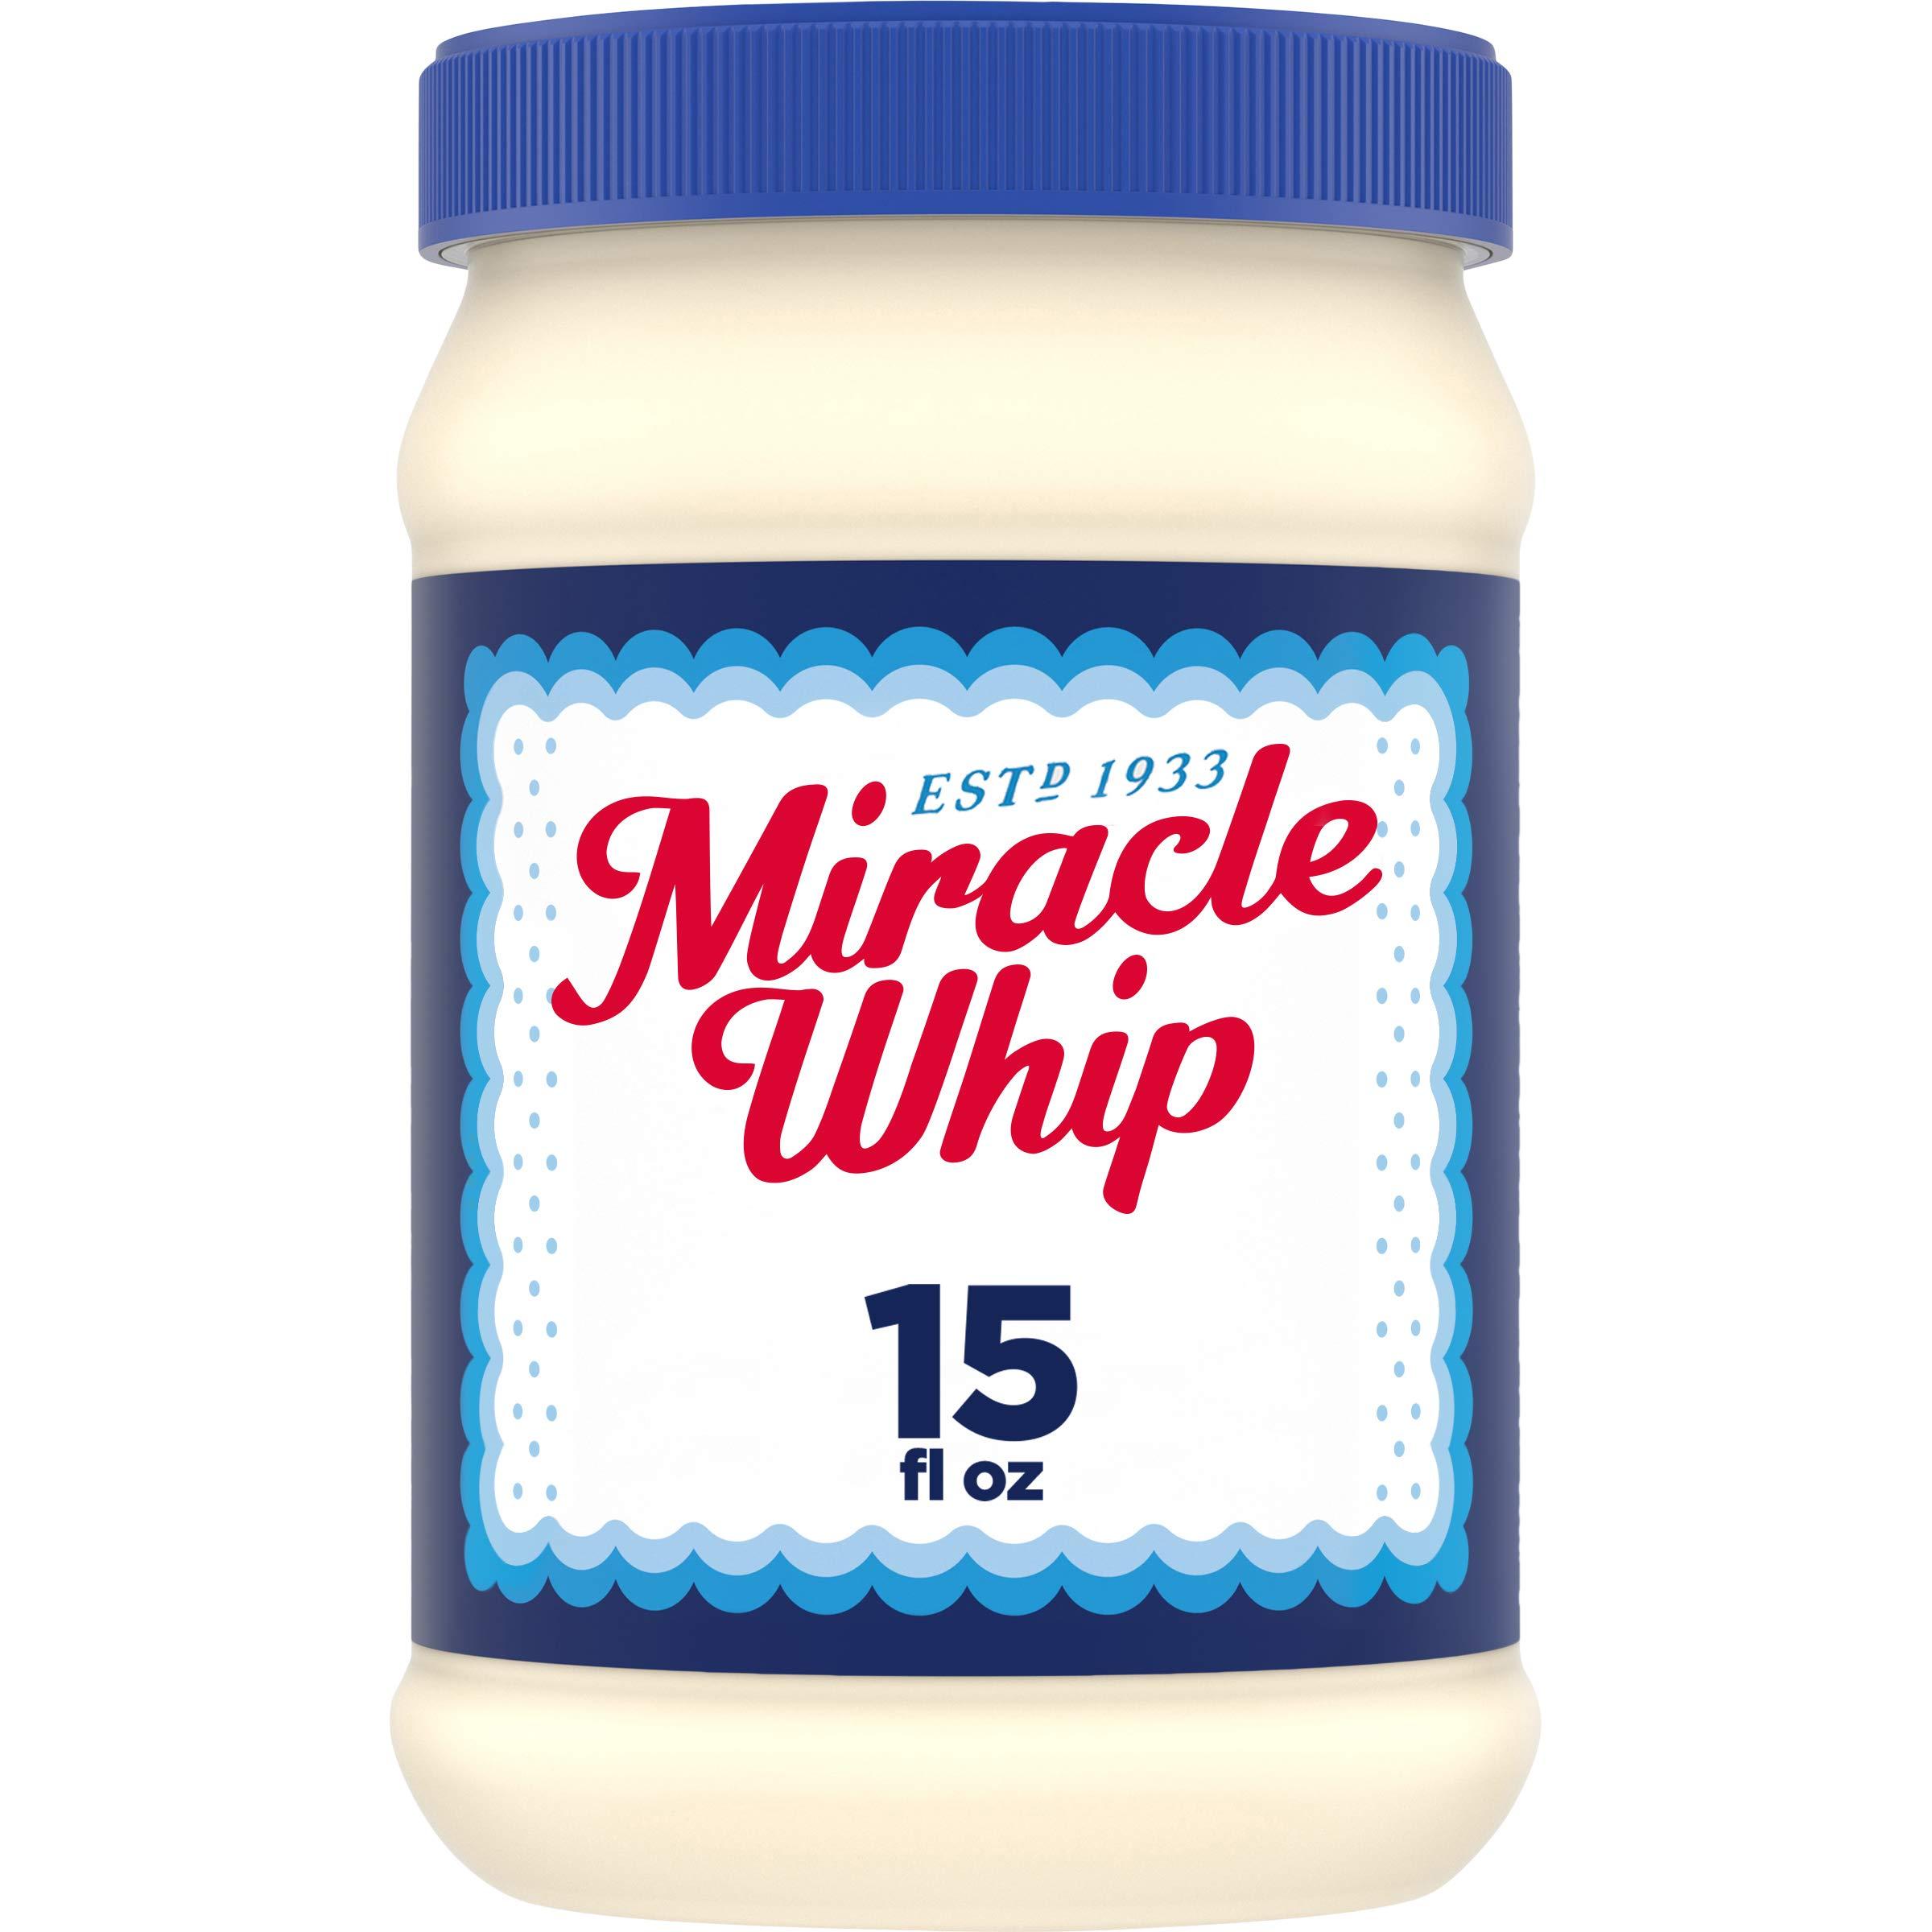 Miracle Whip Original Dressing (15 oz Jars, Pack of 12)